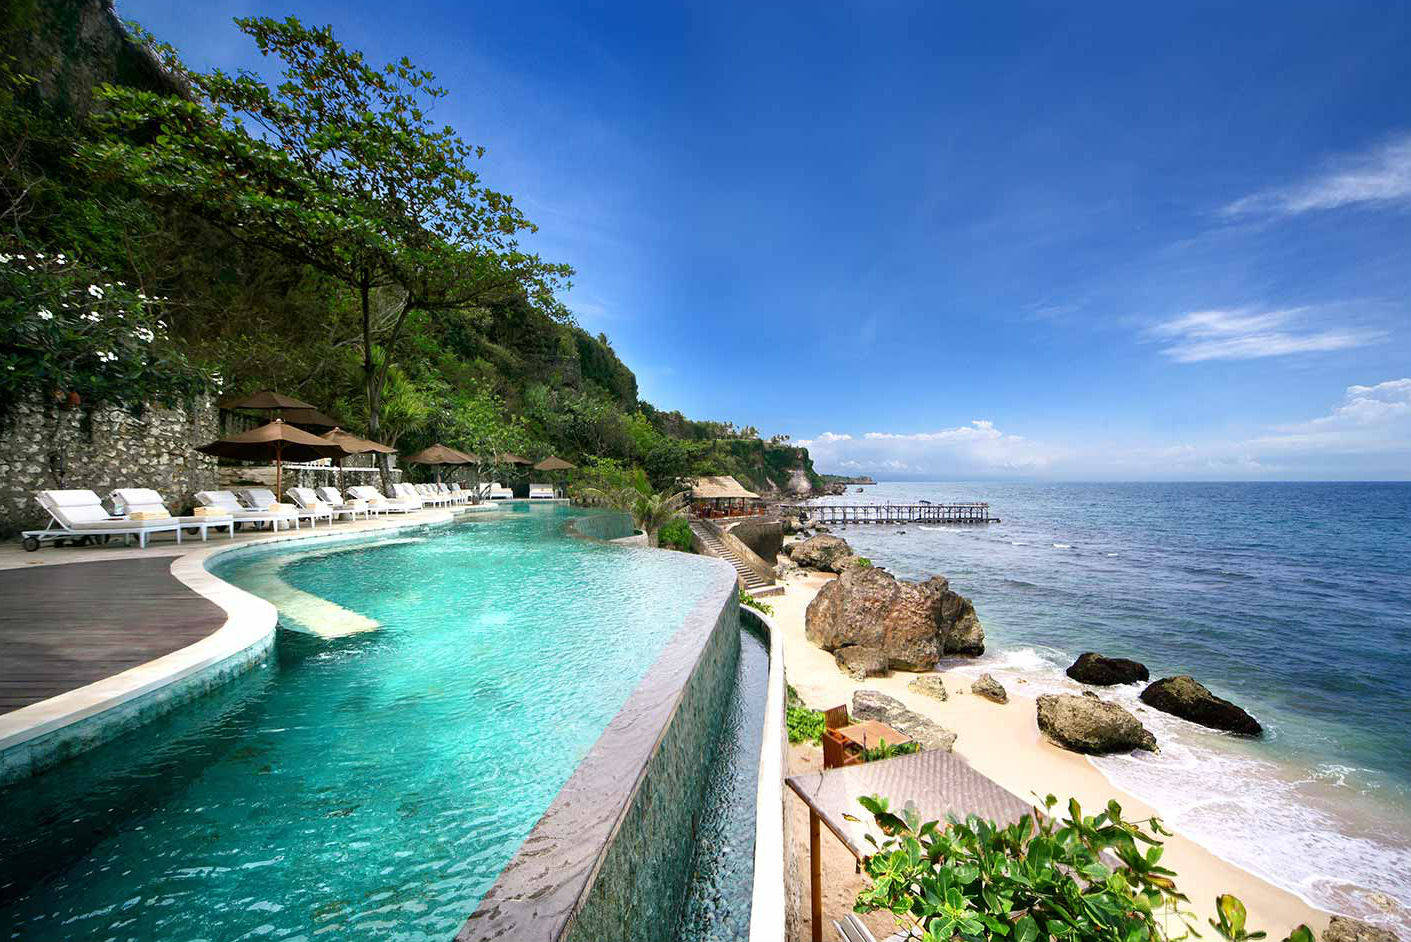 Bali resort champions digital detox, bans smartphones on pool side